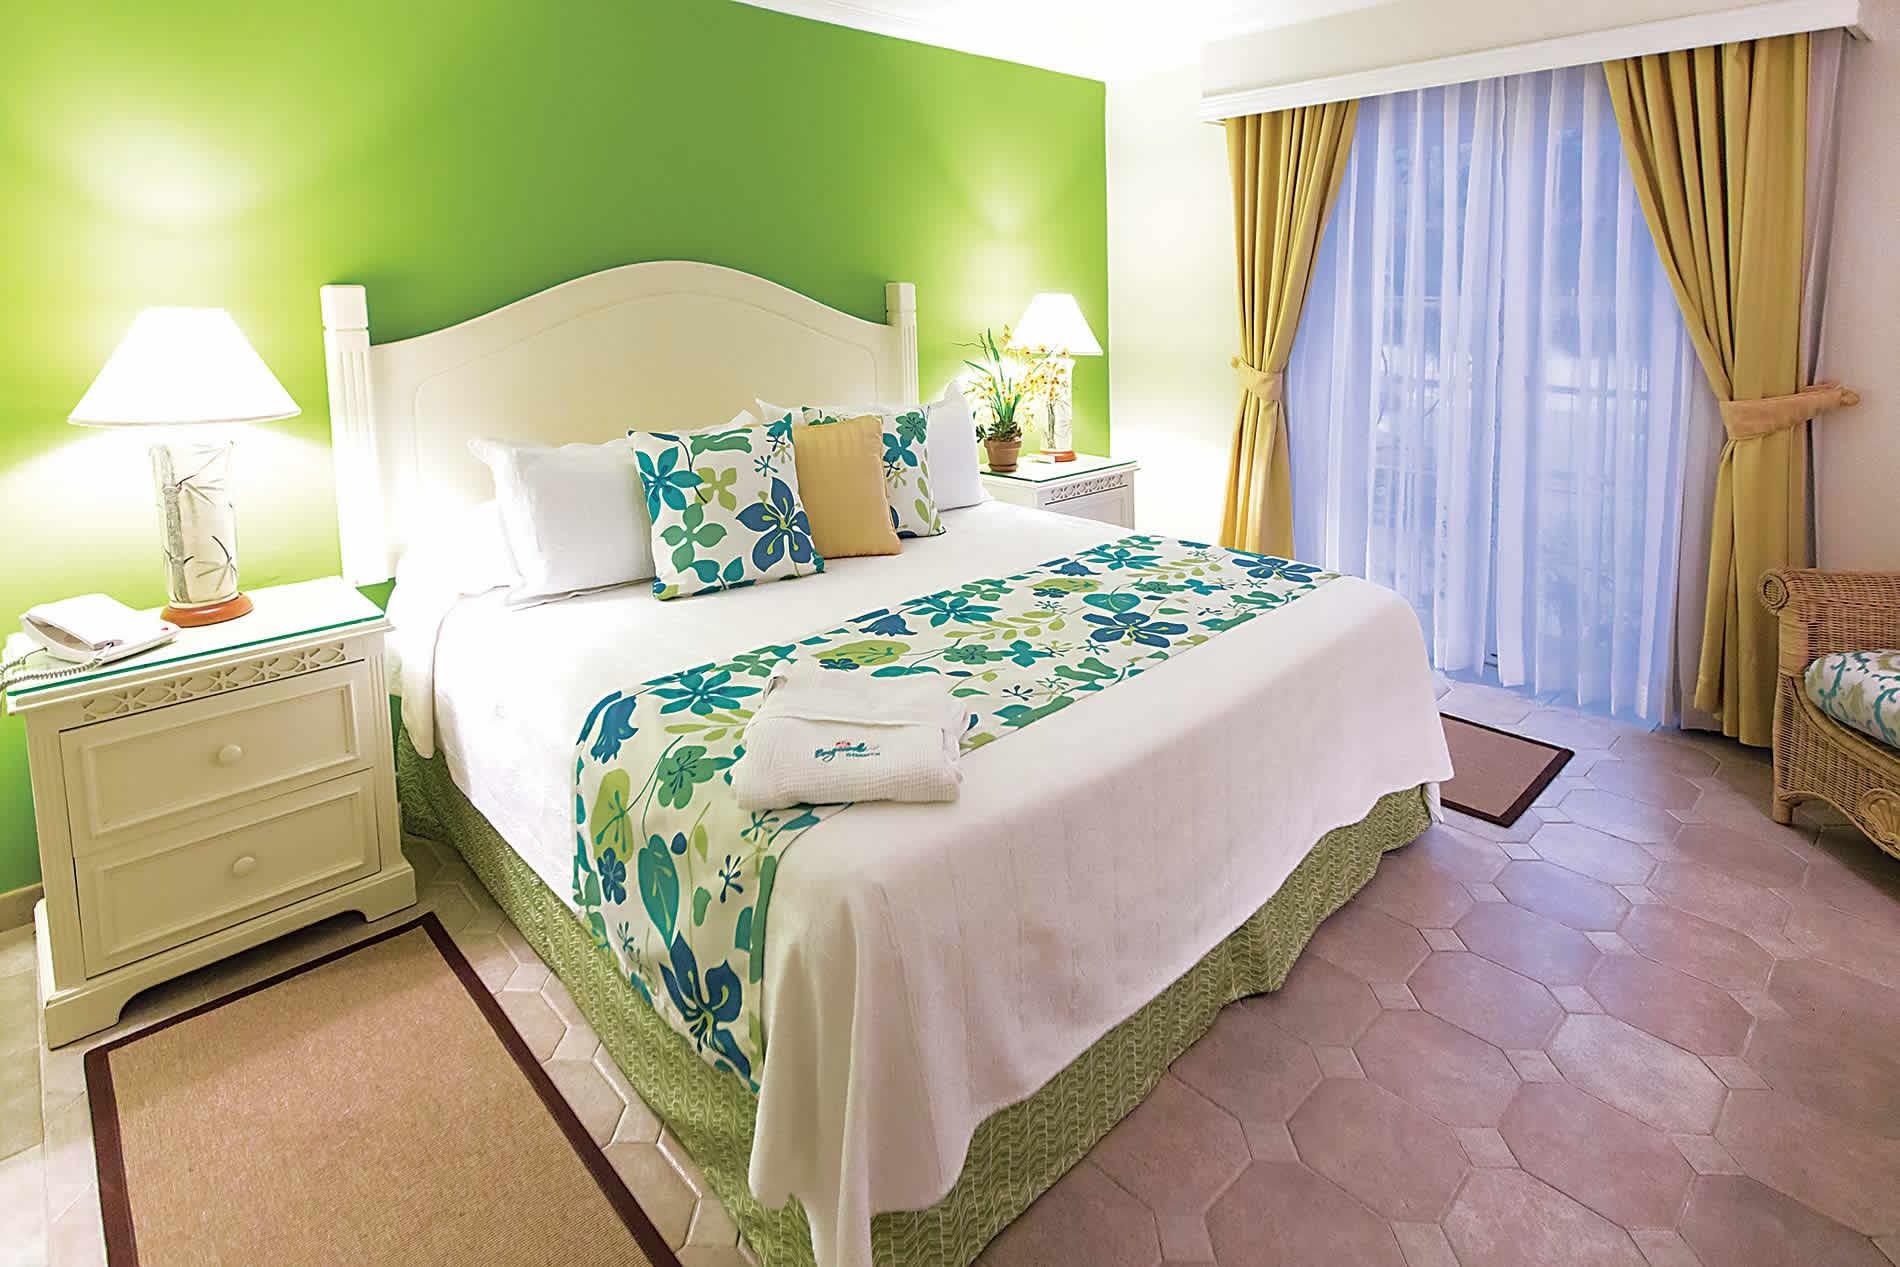 Apartment Bougainvillea A1 Deluxe in Bougainvillea Beach Resort - sleeps 2 people